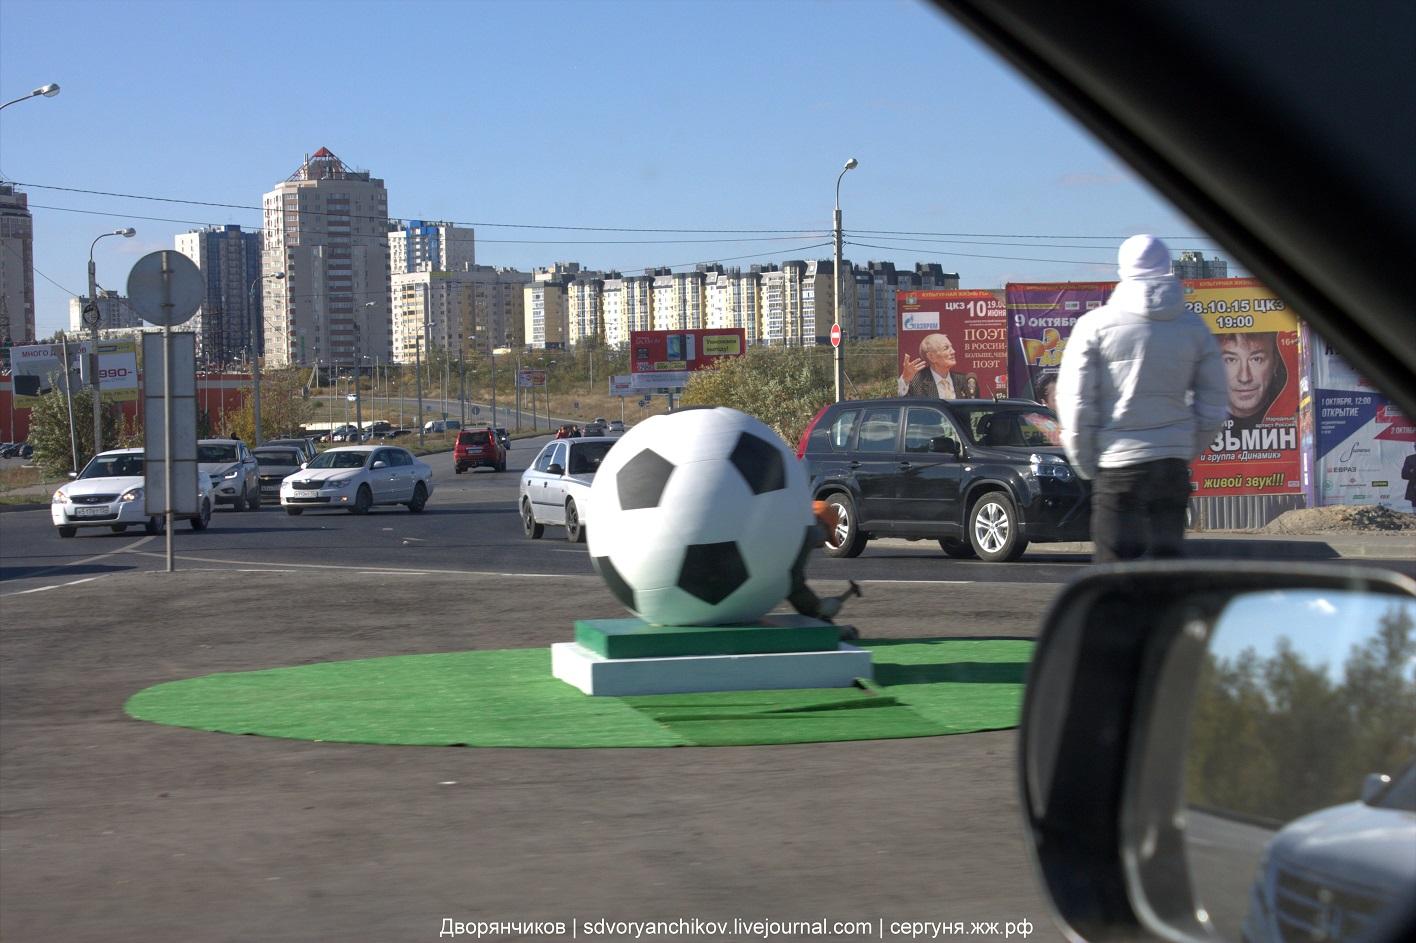 Мяч - Мамаев курган - ЧМ 2018 - 24 октября 2016